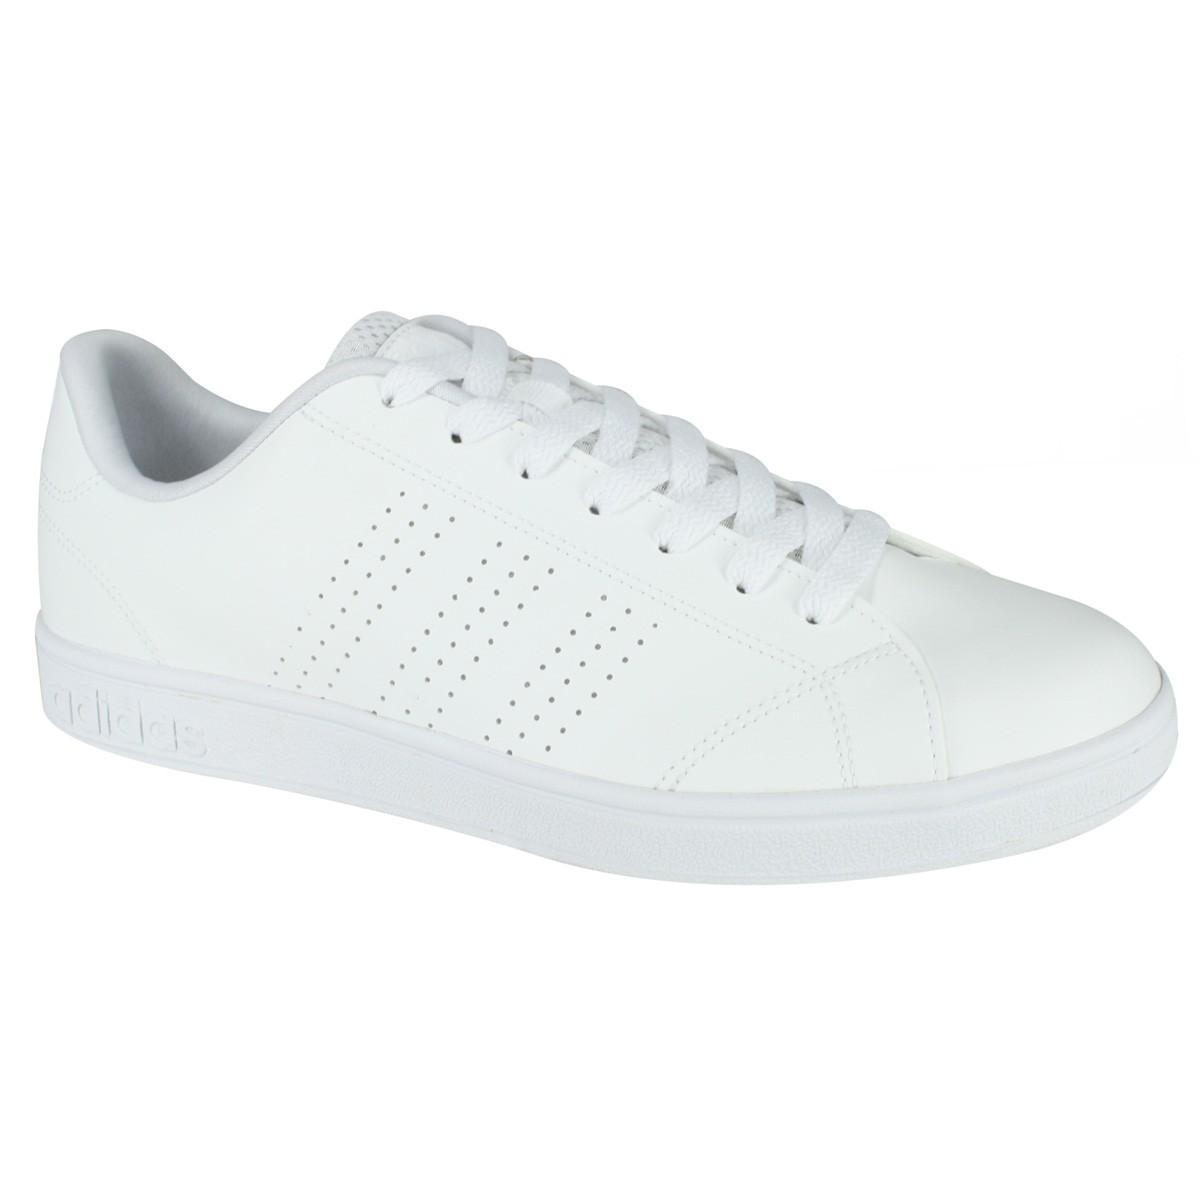 c80432862563e Tênis Adidas Advantage Clean VS B74685 - Branco - Calçados Online ...